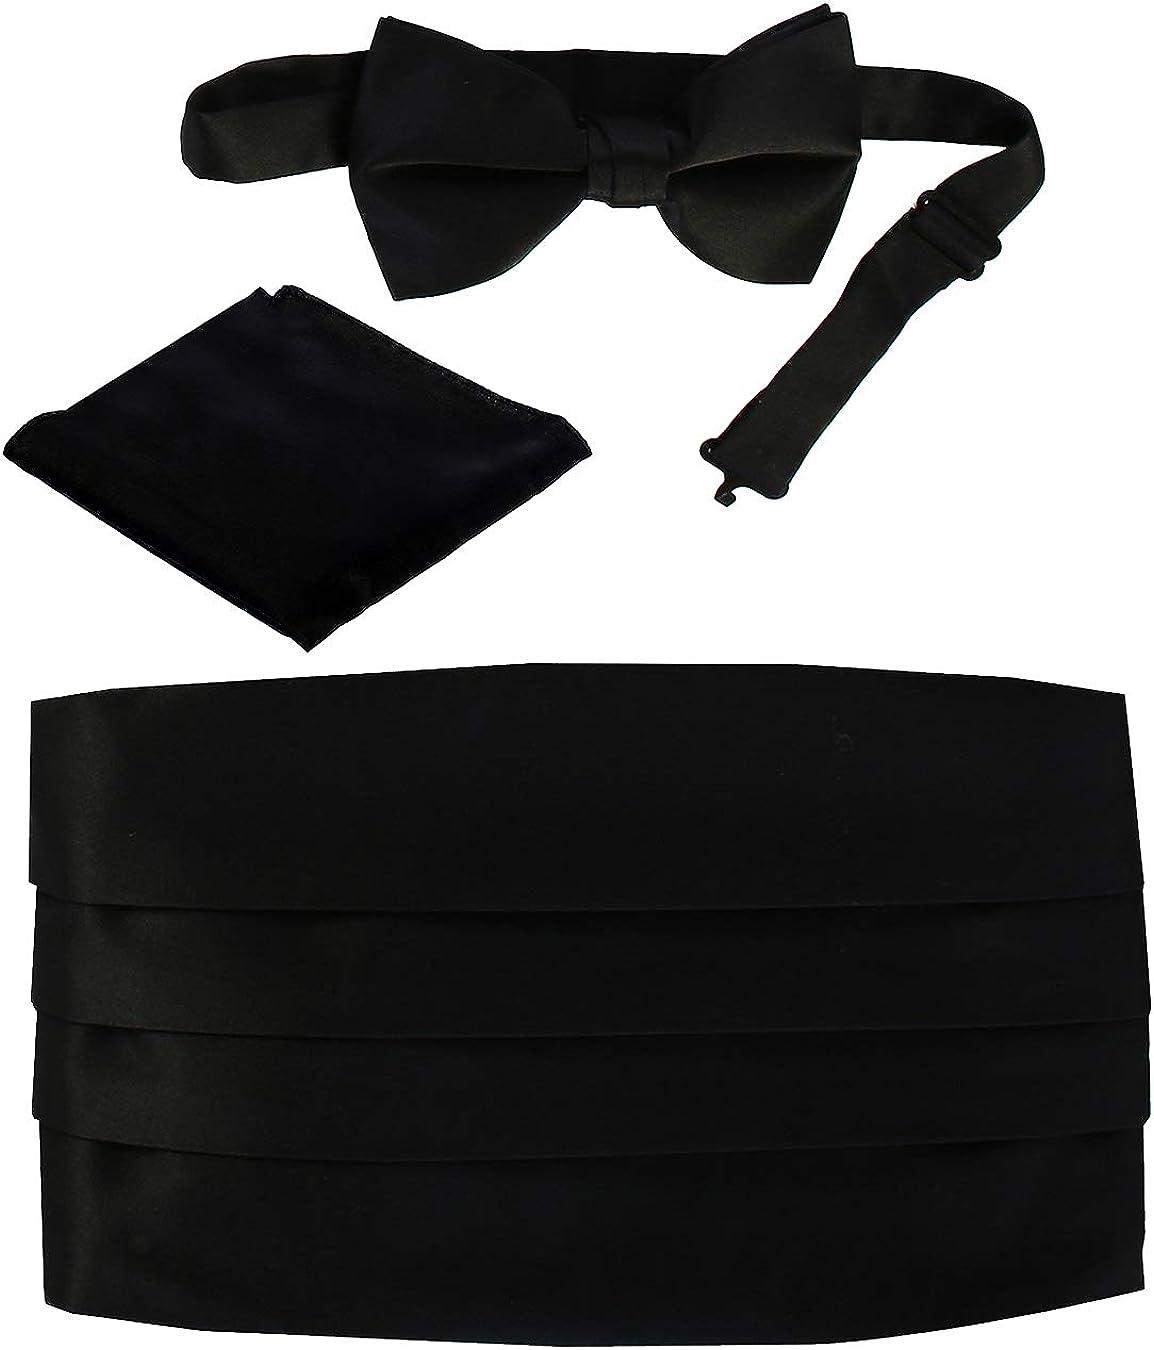 Brand new Multi-color Paisley Satin Tuxedo Mens Bow Tie//Pocket Square SET B1517